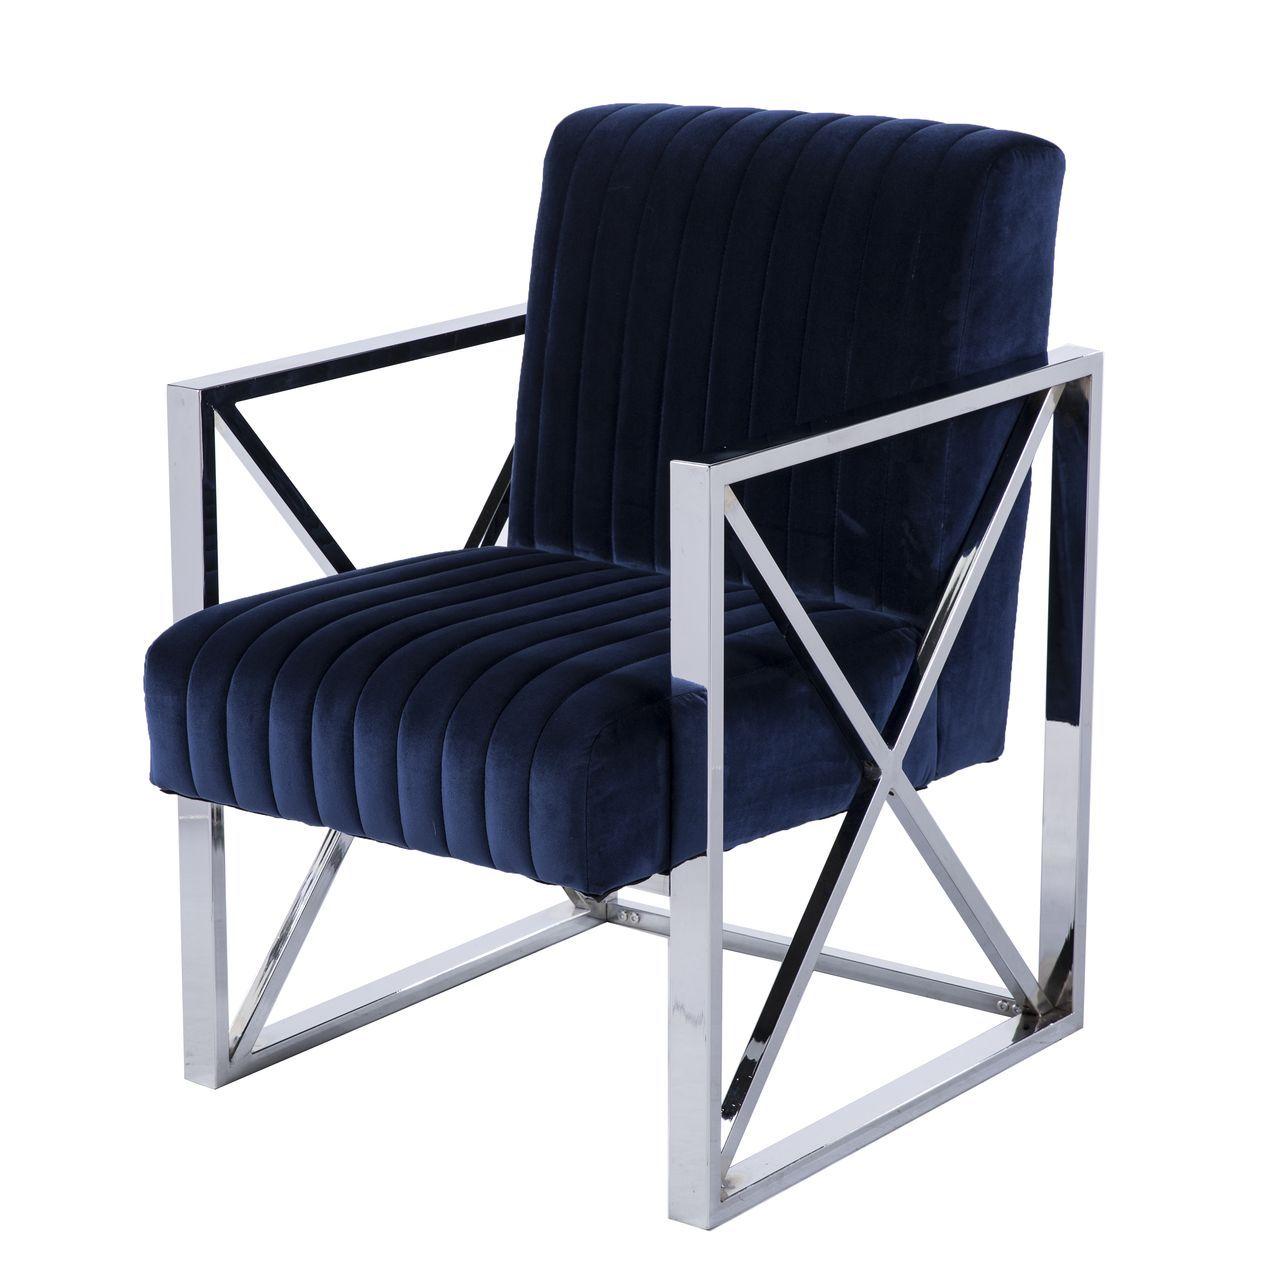 SEI Ellison Velveteen Modern Glam Chair and Ottoman in Blue / Chrome